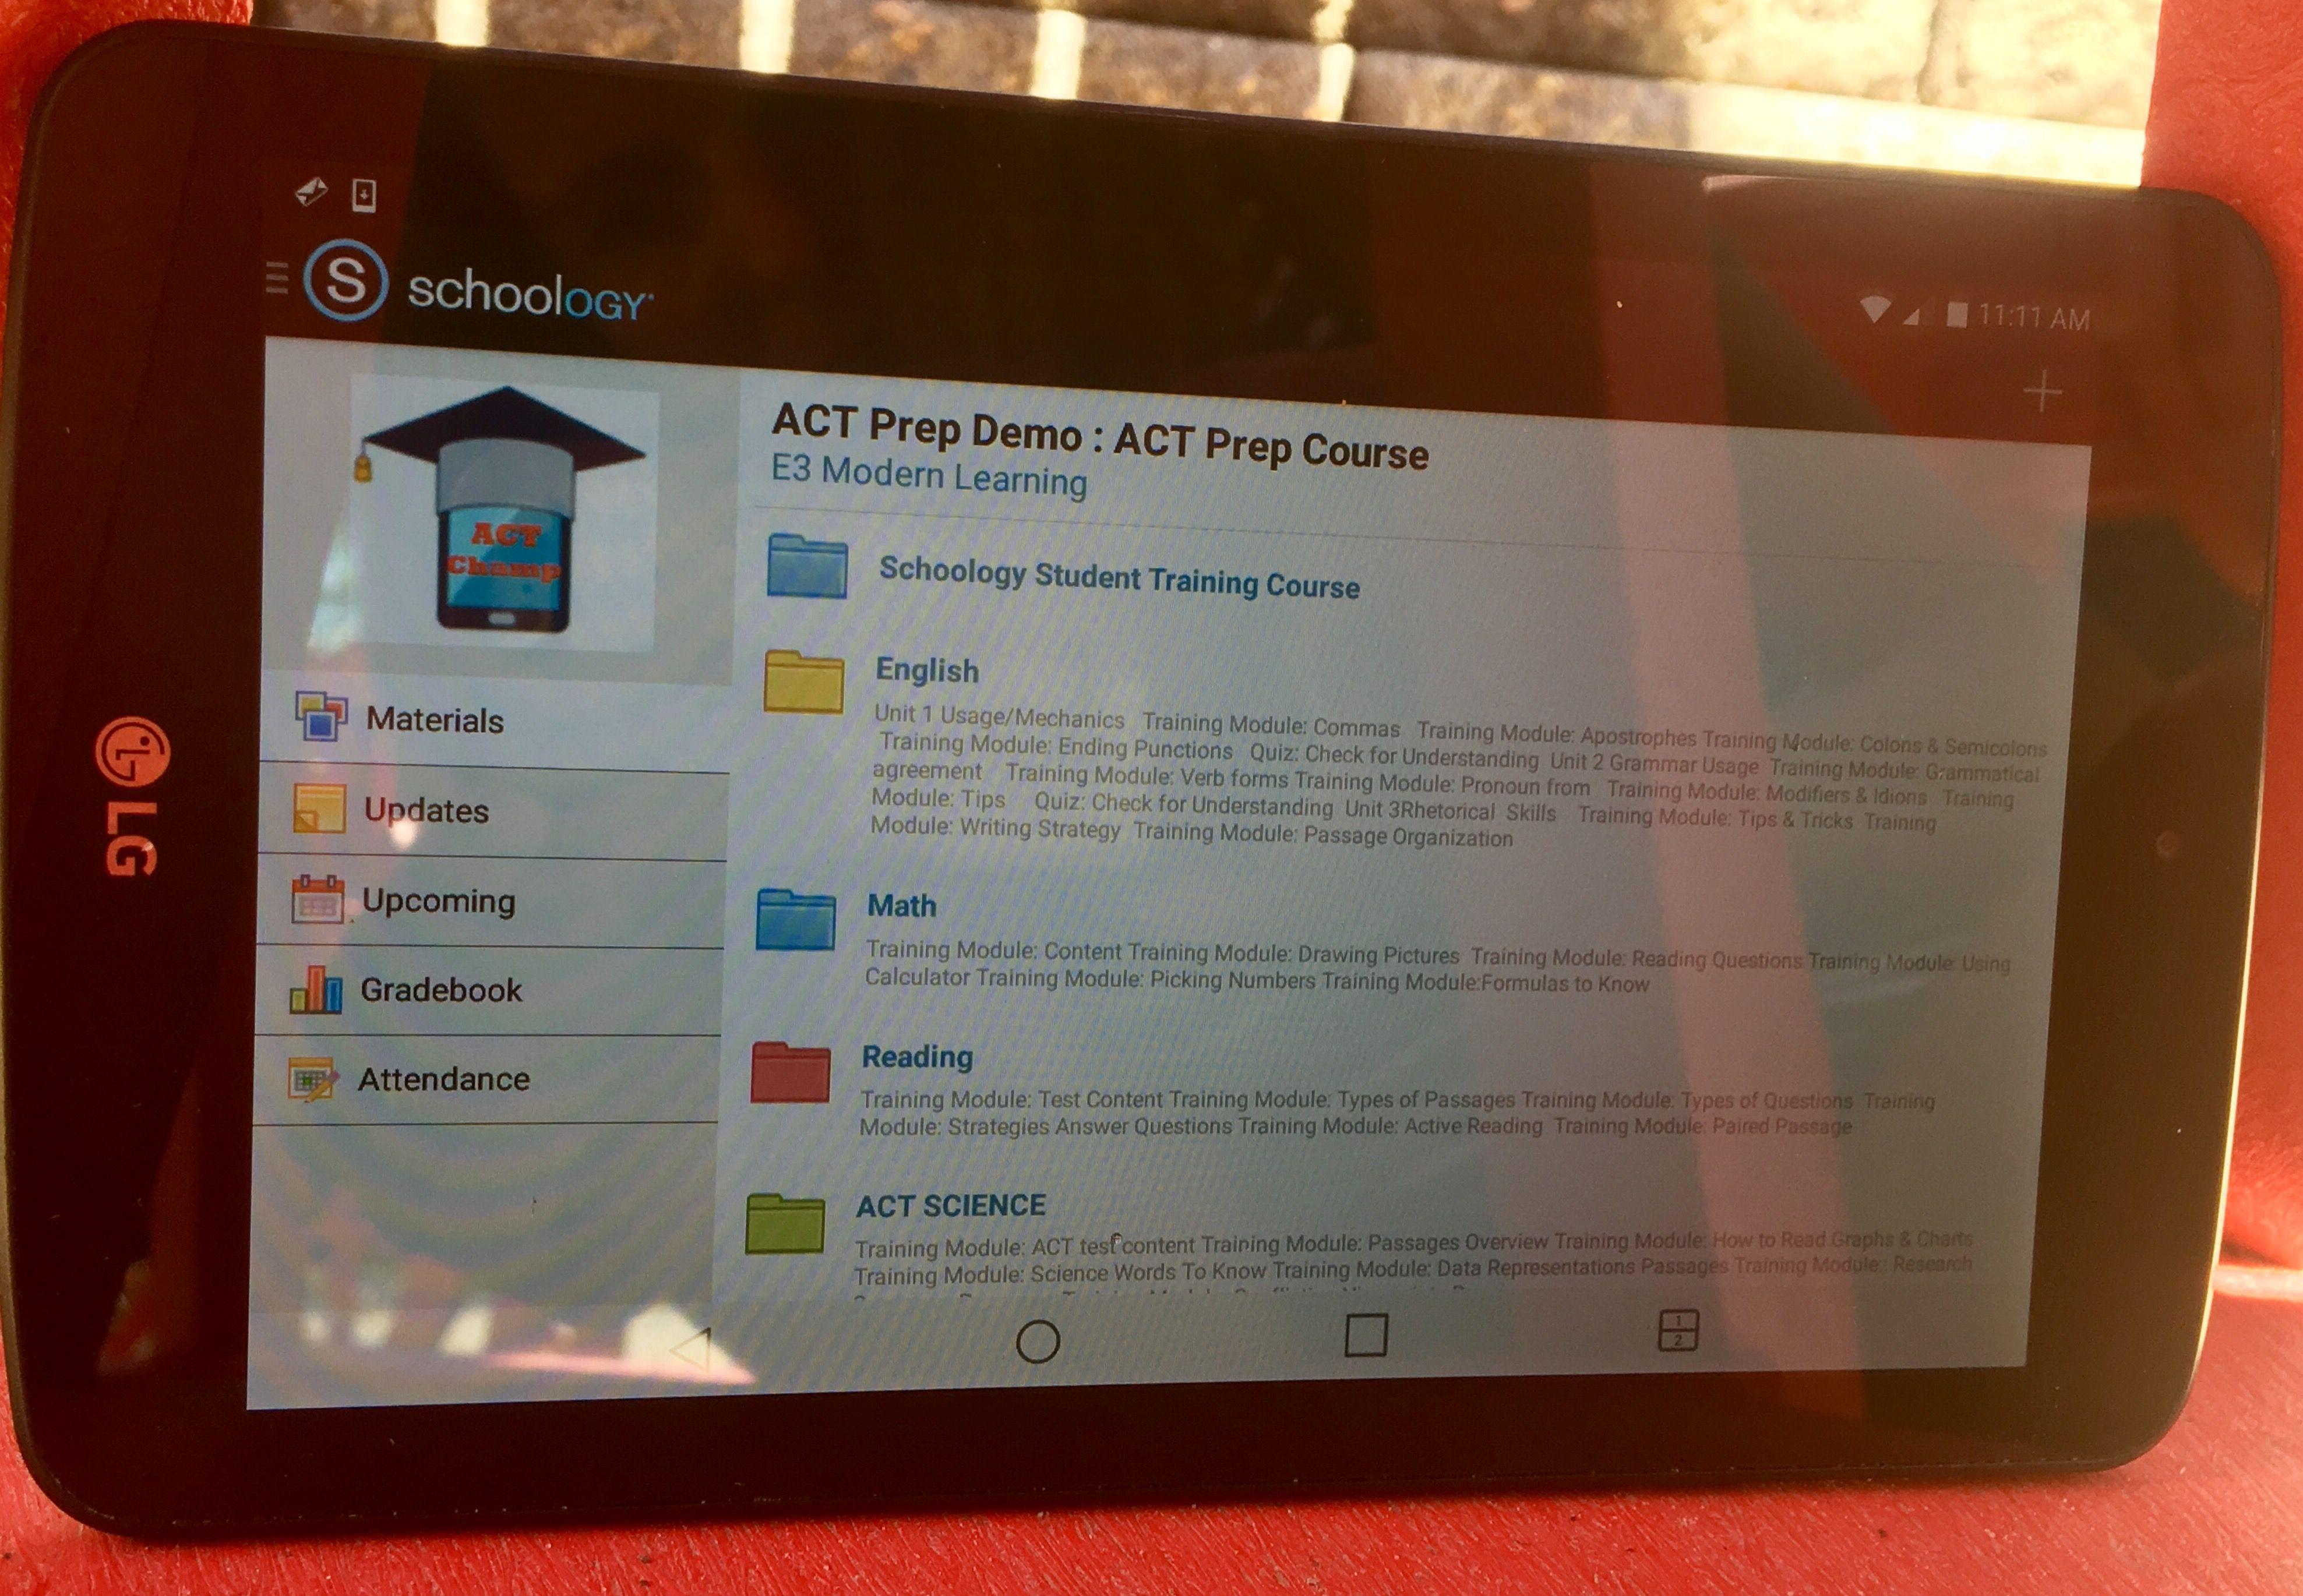 Online #ACT test prep using schoology. | Study Math Online ...